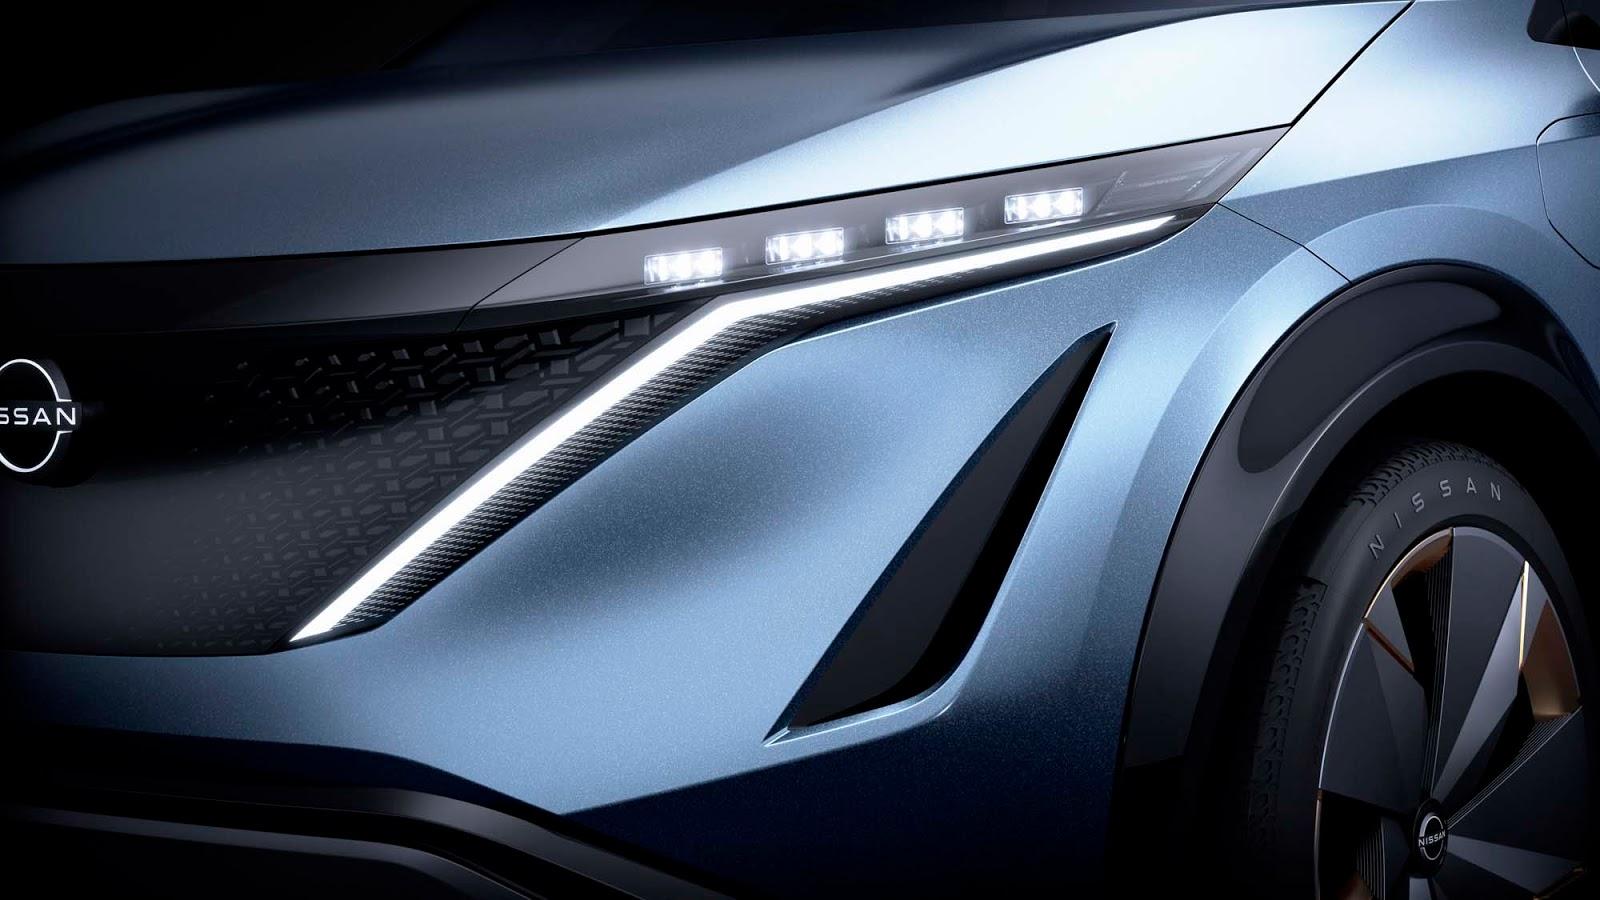 Nissan2BARIYA2BConcept 10 Με αυτό το μοντέλο η Nissan μας δείχνει το μέλλον της Electric cars, Nissan, Έκθεση, ιαπωνικά